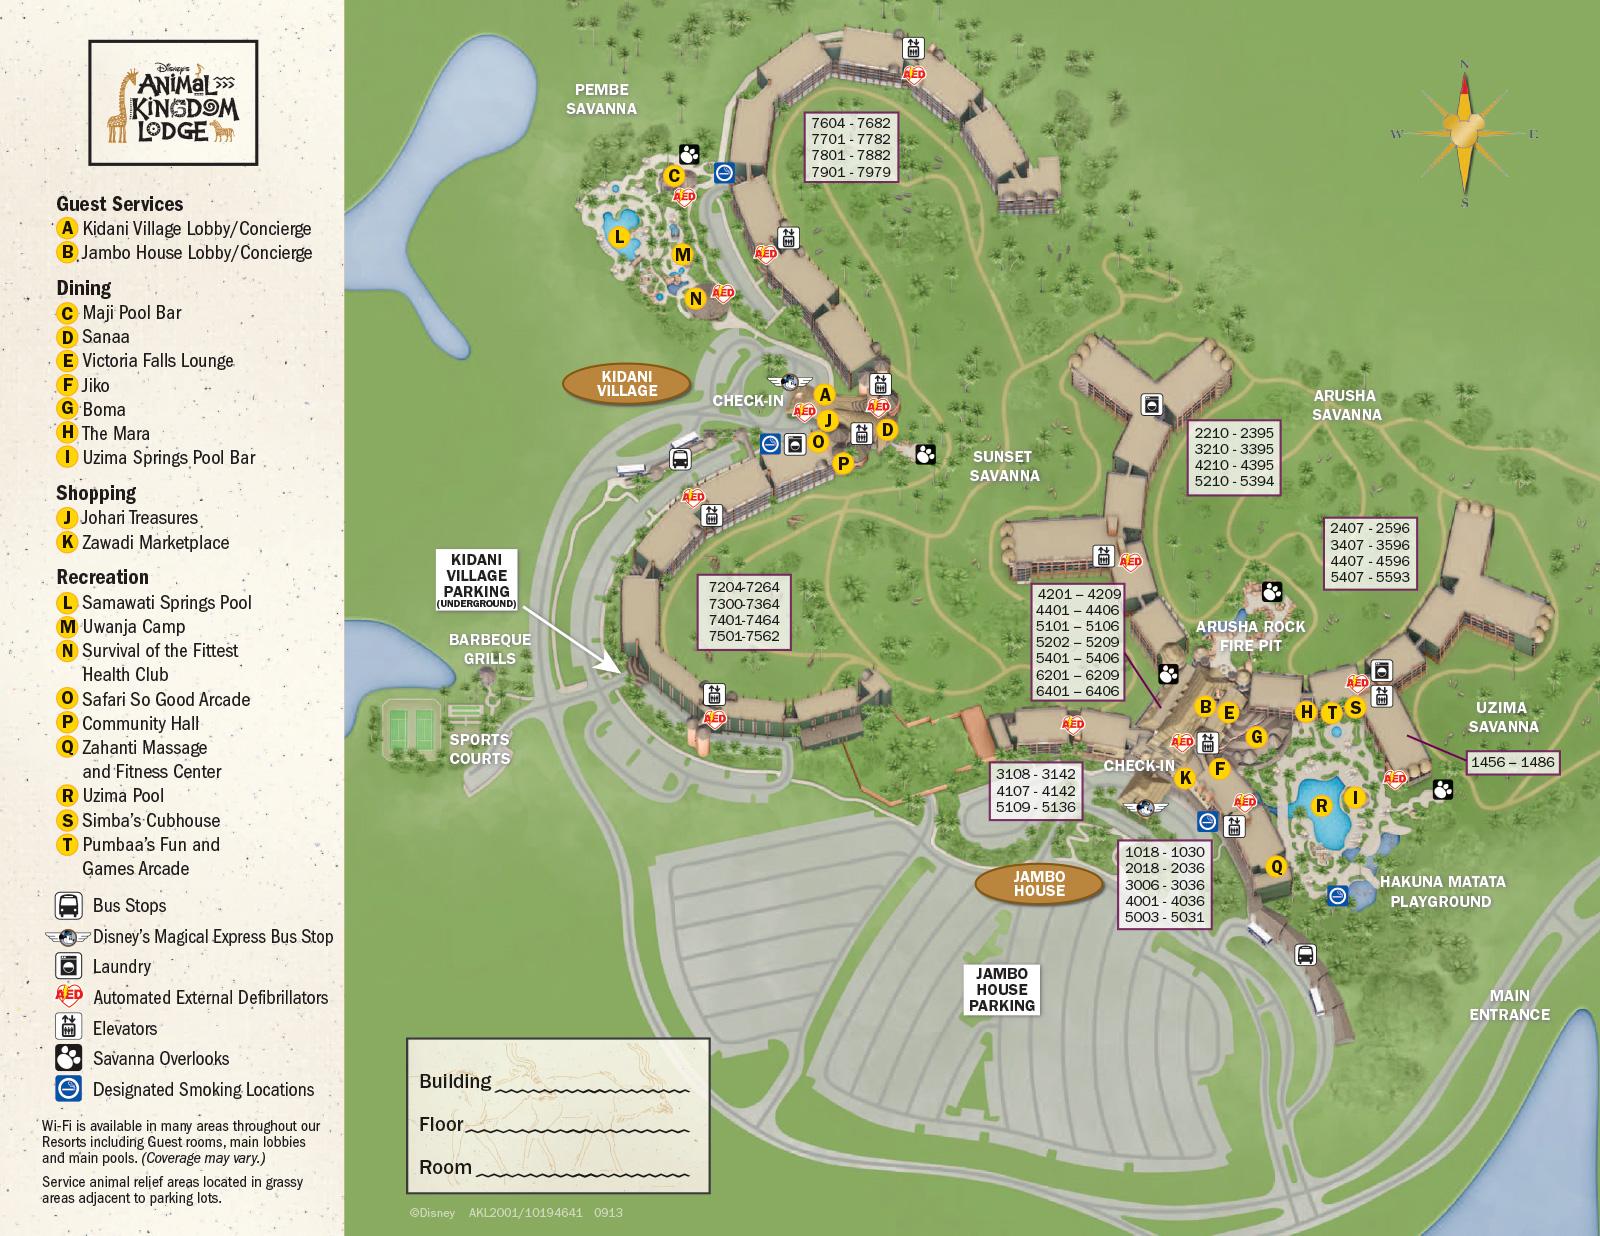 2013 Animal Kingdom Lodge guide map